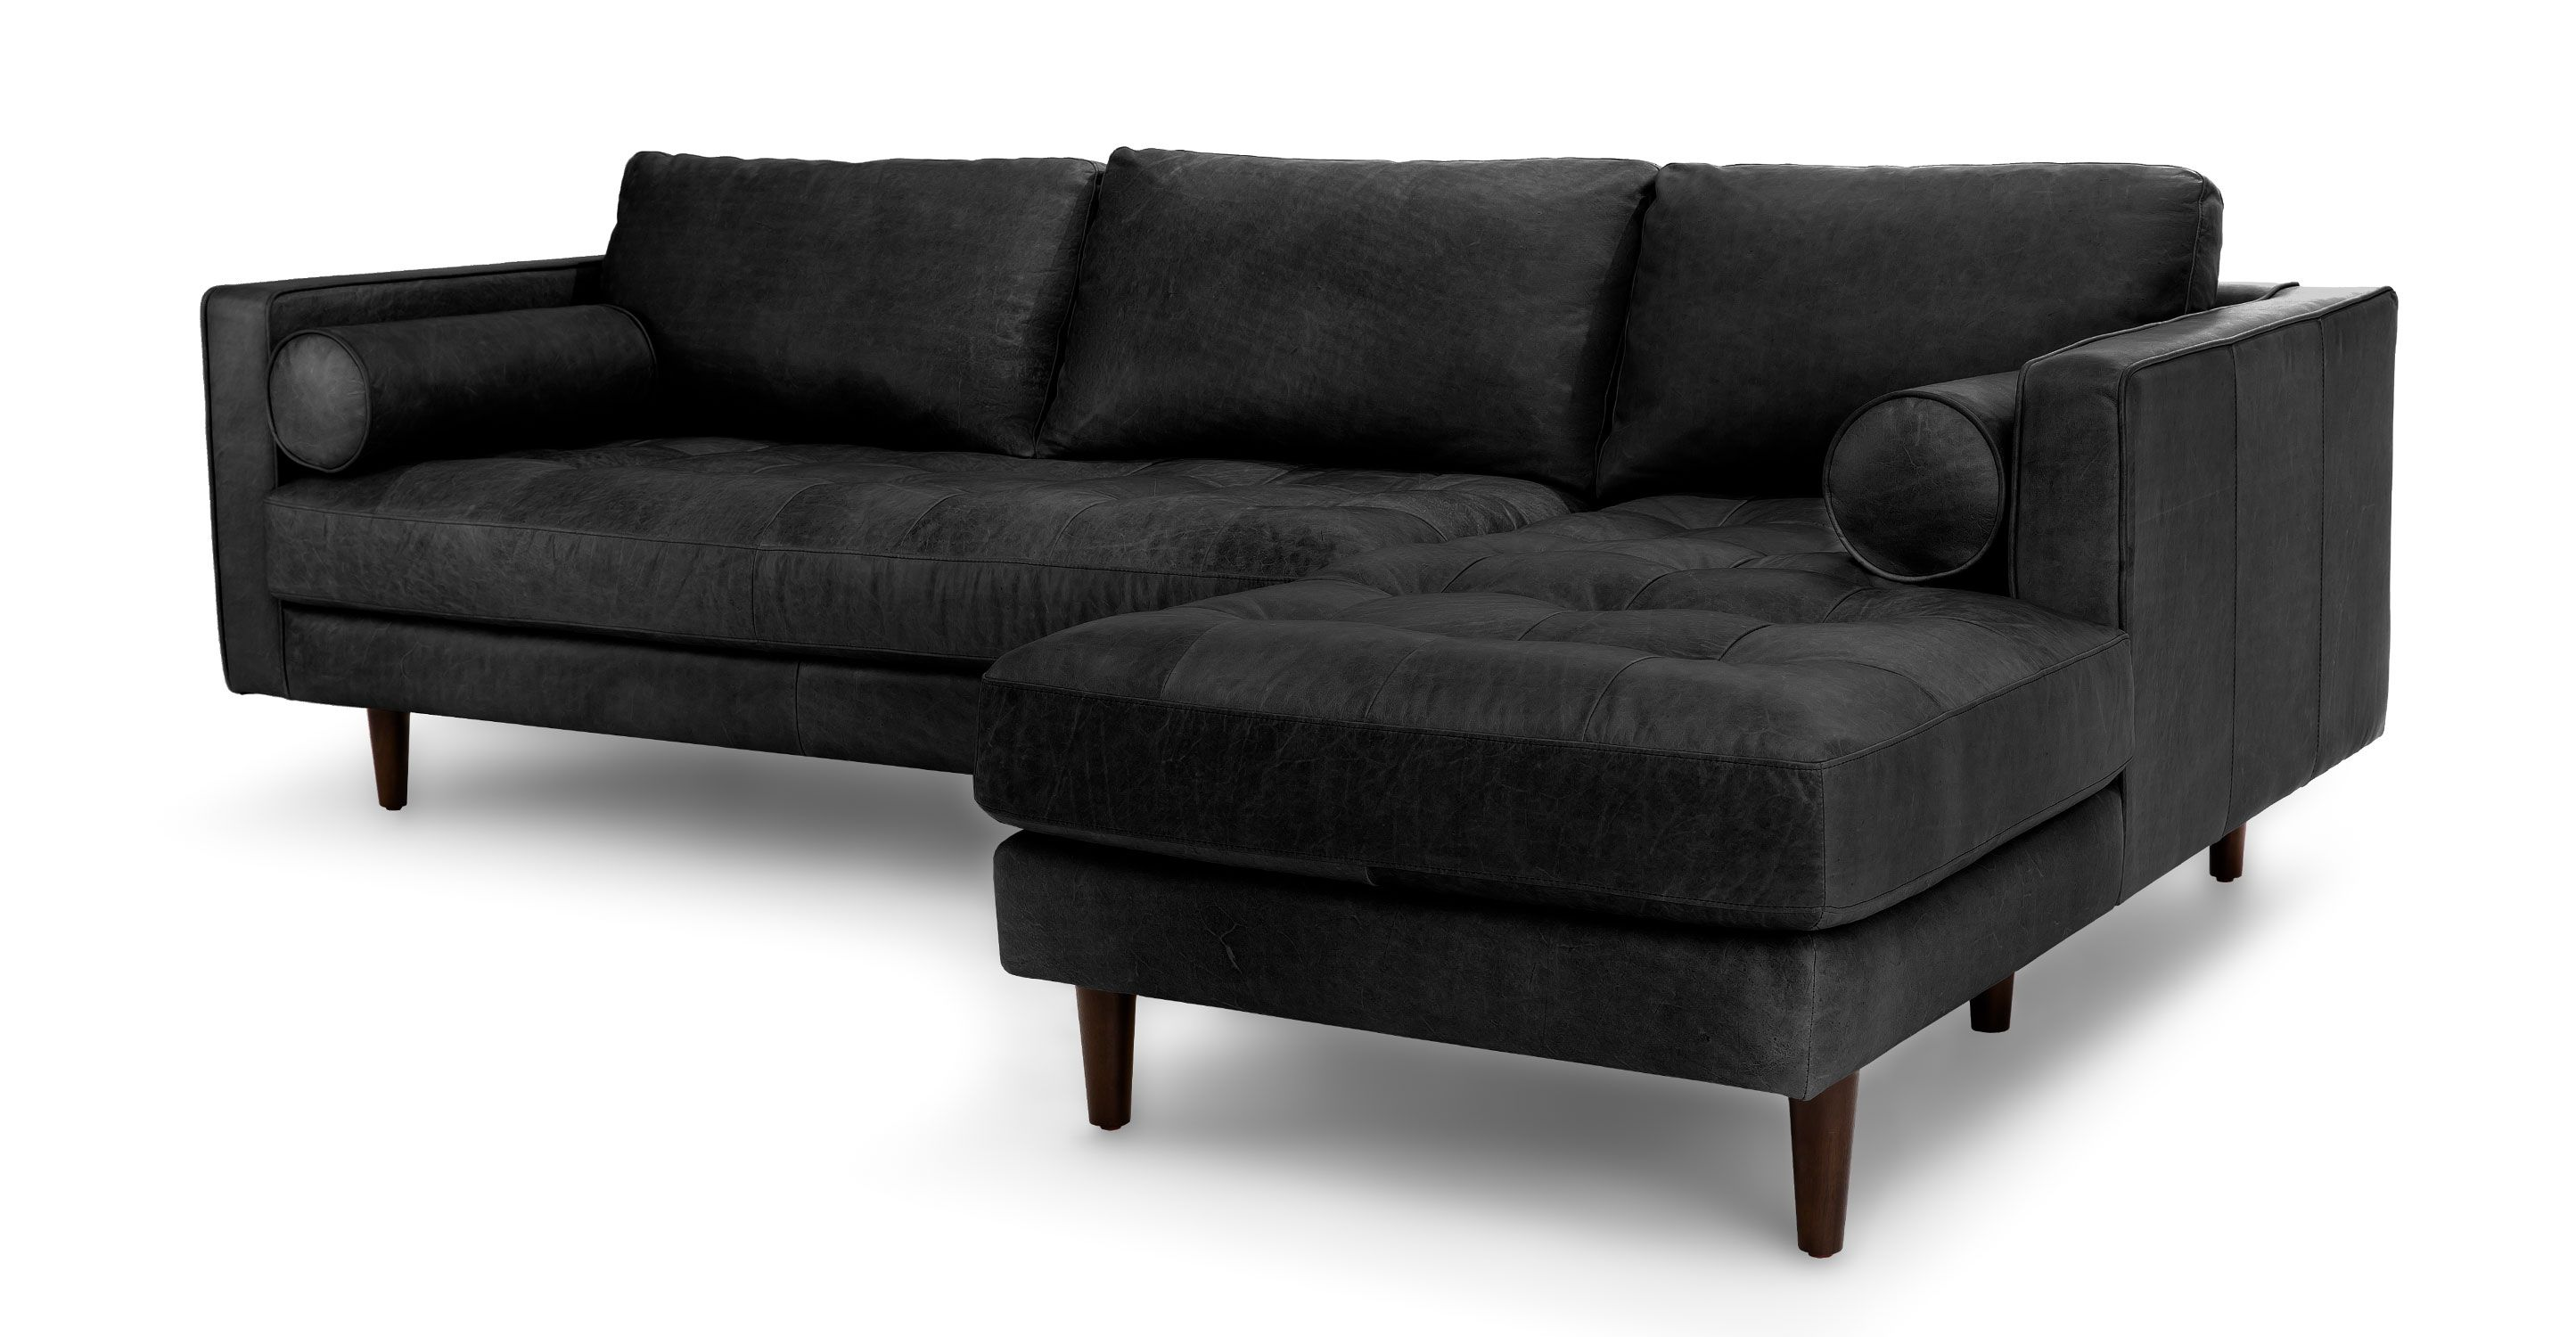 Sven Oxford Black Right Sectional Sofa Sofa Sectional Sofa Grey Sectional Sofa